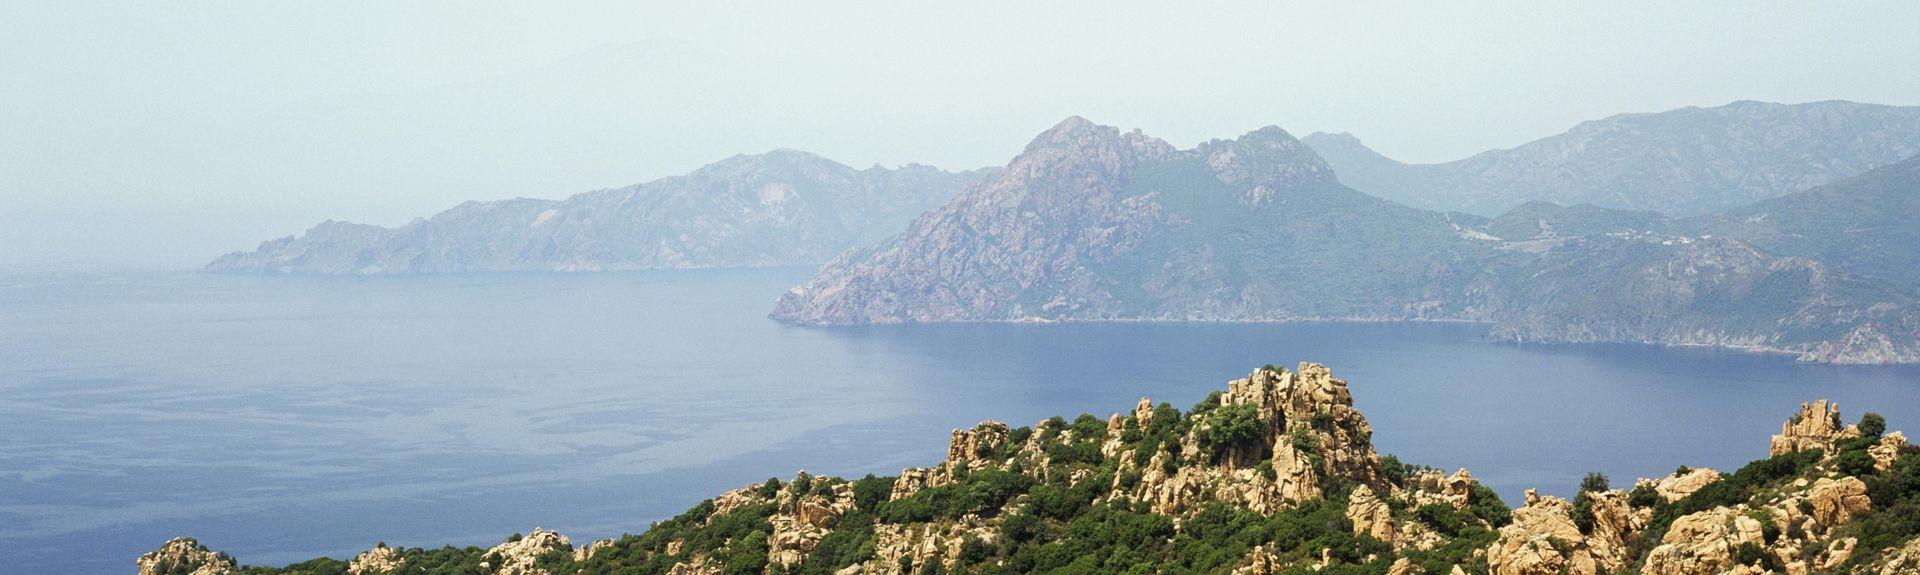 Piana, Corsica, Francia